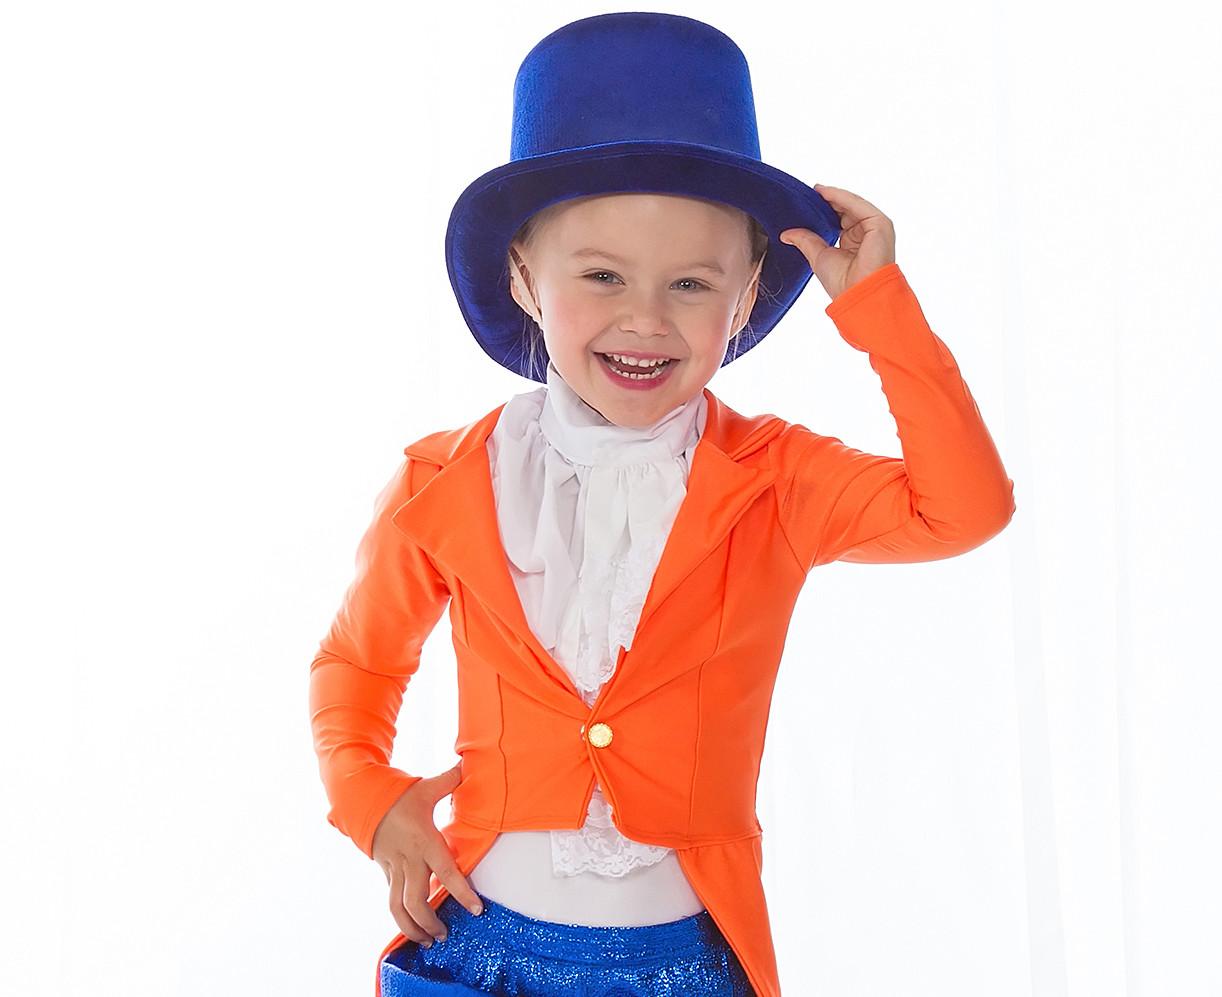 Dance Classes for Kids in Port Moody, Tri-Cites (including Coquitlam, Port Coquitlam, etc.), BC